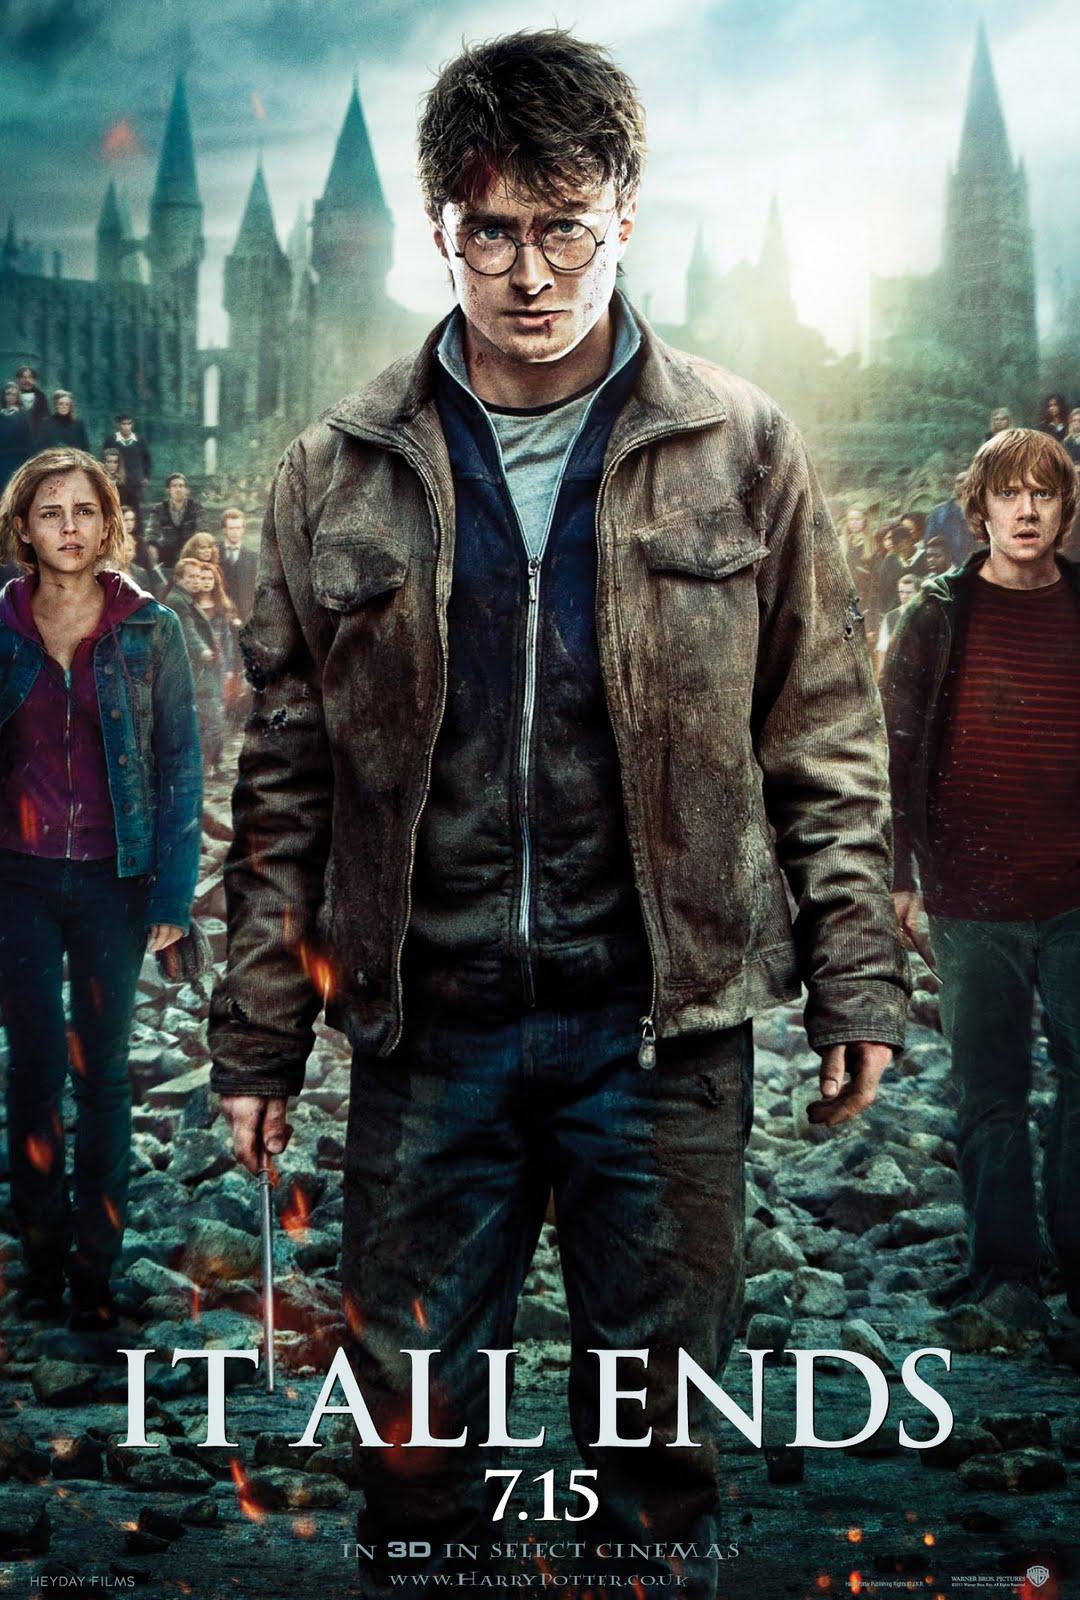 http://4.bp.blogspot.com/-E-BUw1IBLX8/Tjvy258XgRI/AAAAAAAACds/6zoul1WF_kM/s1600/Theatrical-Poster-di-Harry-Potter-e-i-doni-della-morte-Parte-2%255B1%255D.jpg